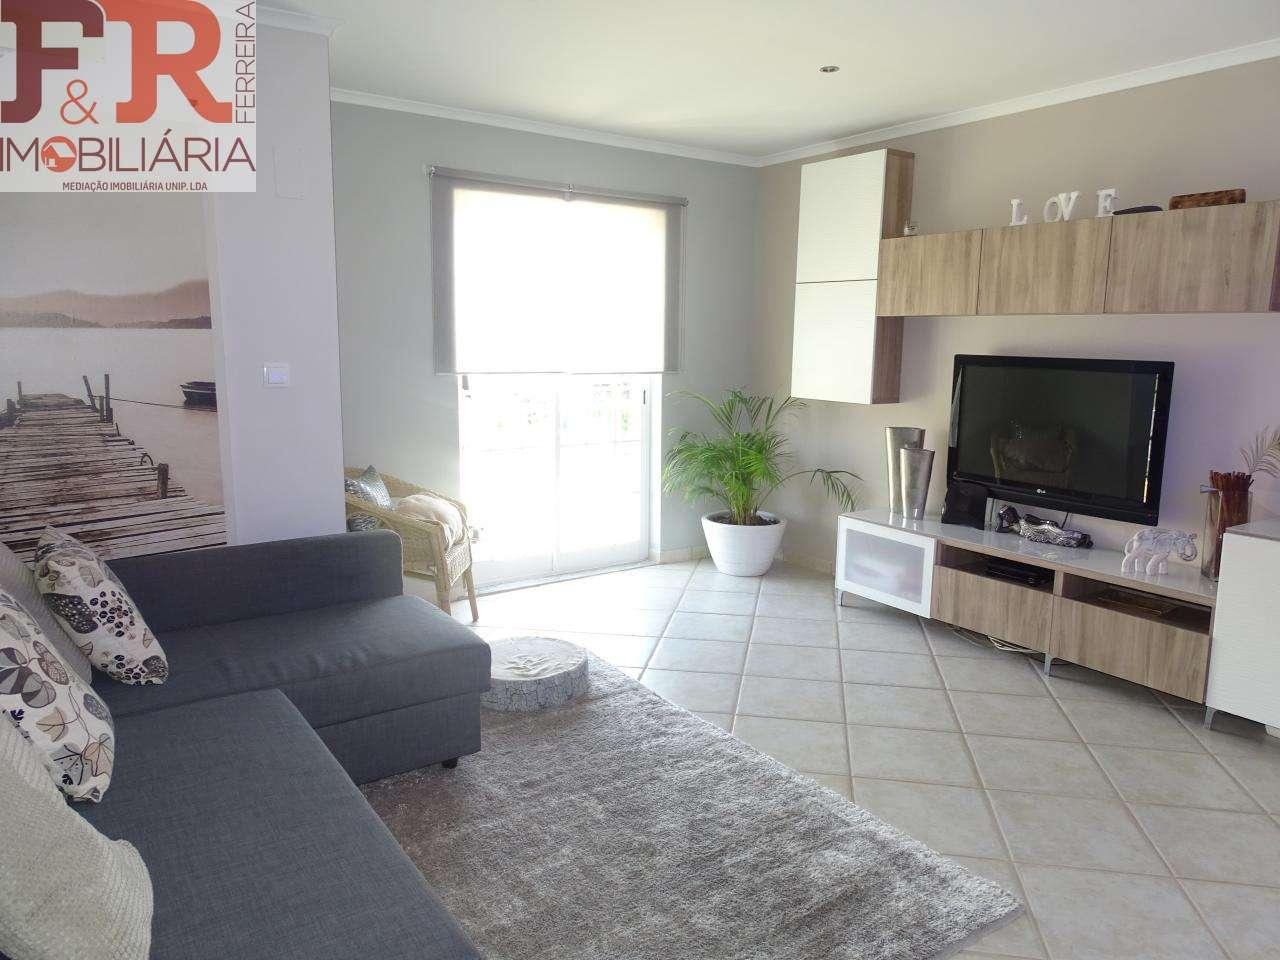 Apartamento para comprar, Quinta do Conde, Setúbal - Foto 31